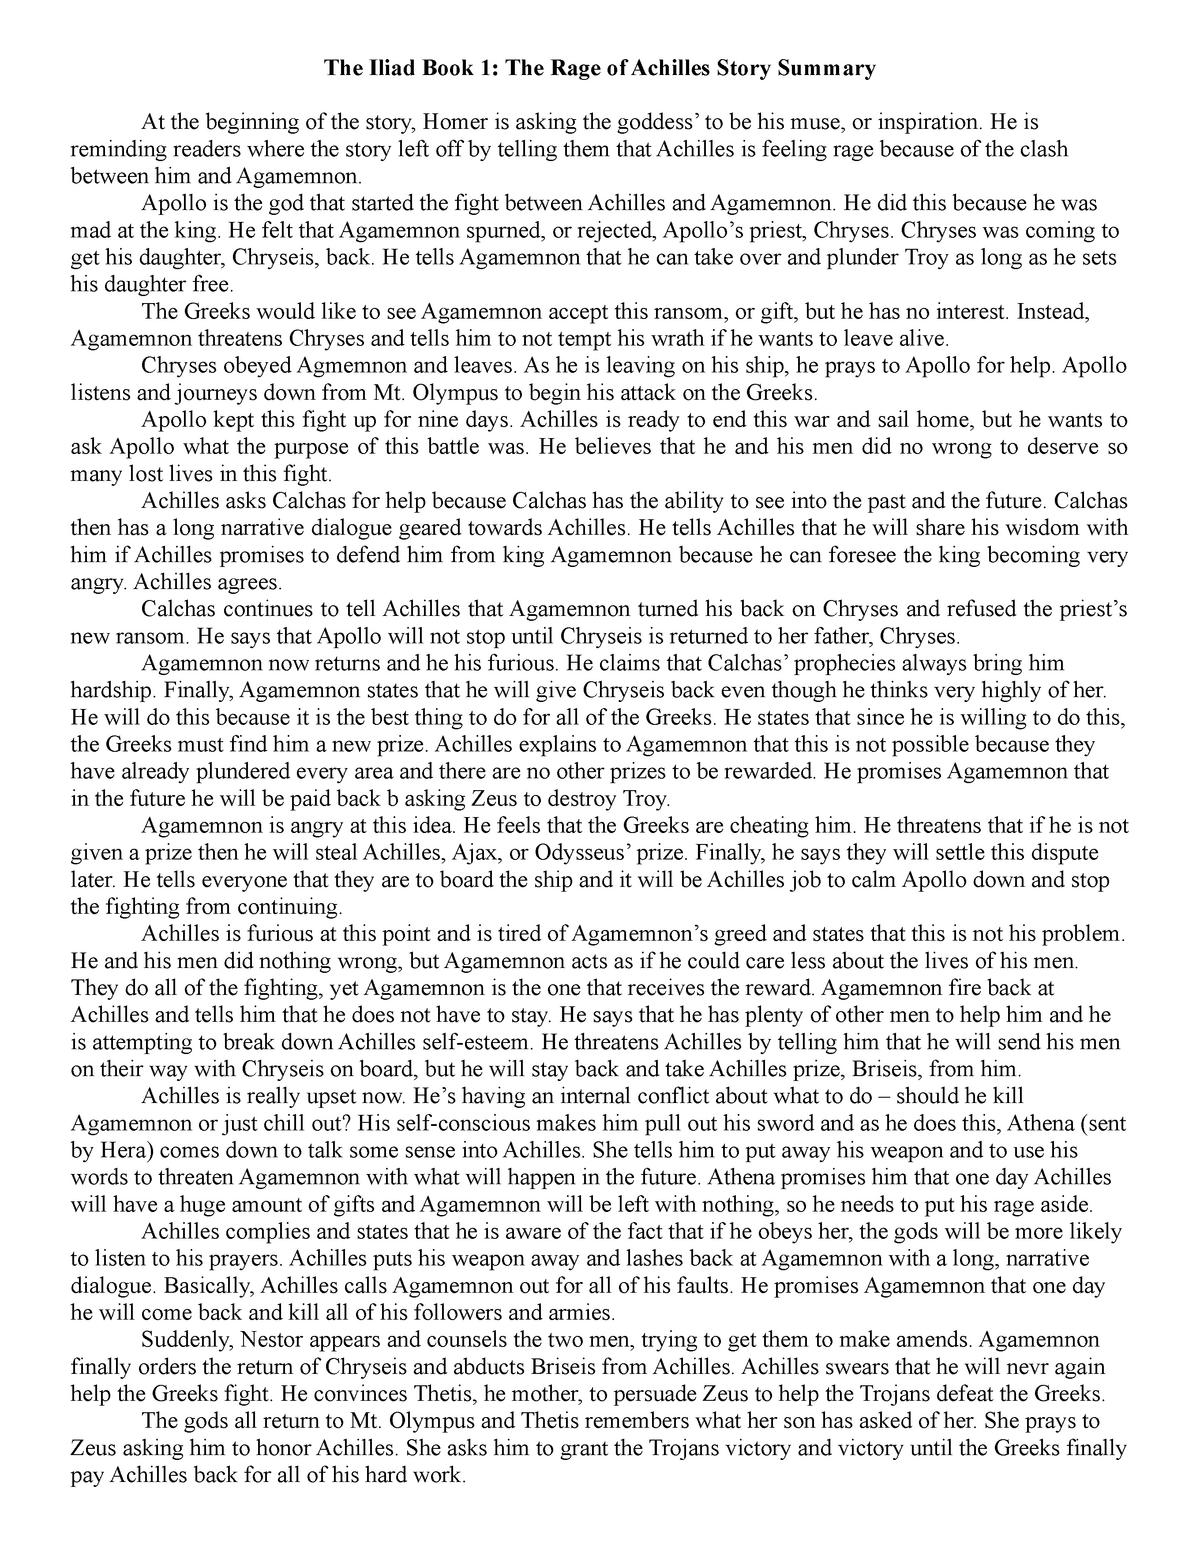 iliad book 3 summary